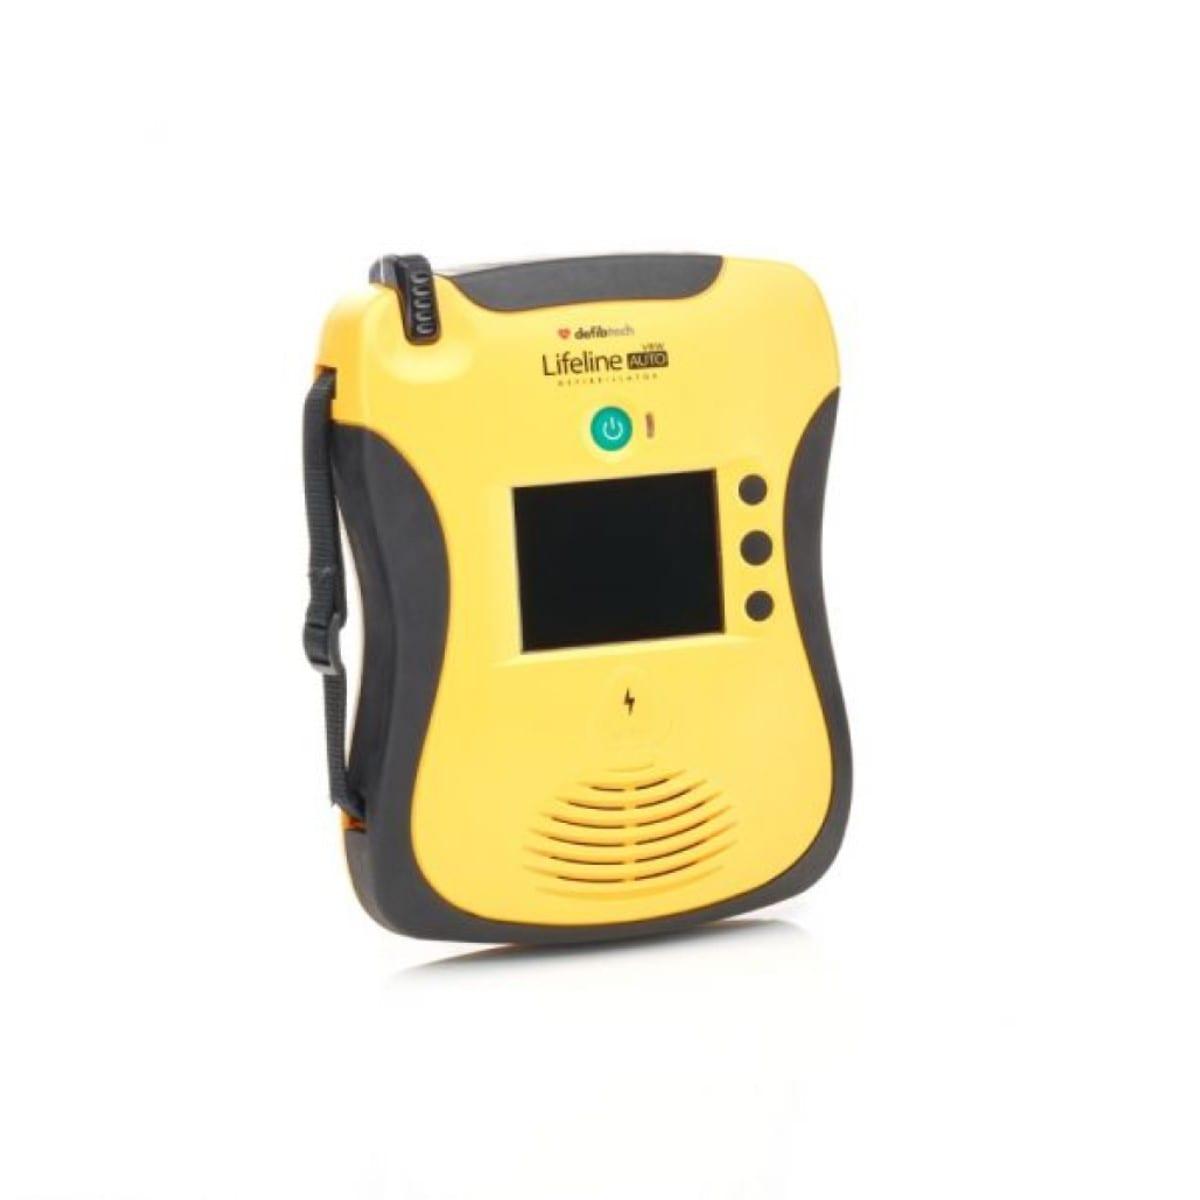 Defibtech Lifeline VIEW AED-Volautomaat-Nederlands-Frans - Janhofman.nl - 1